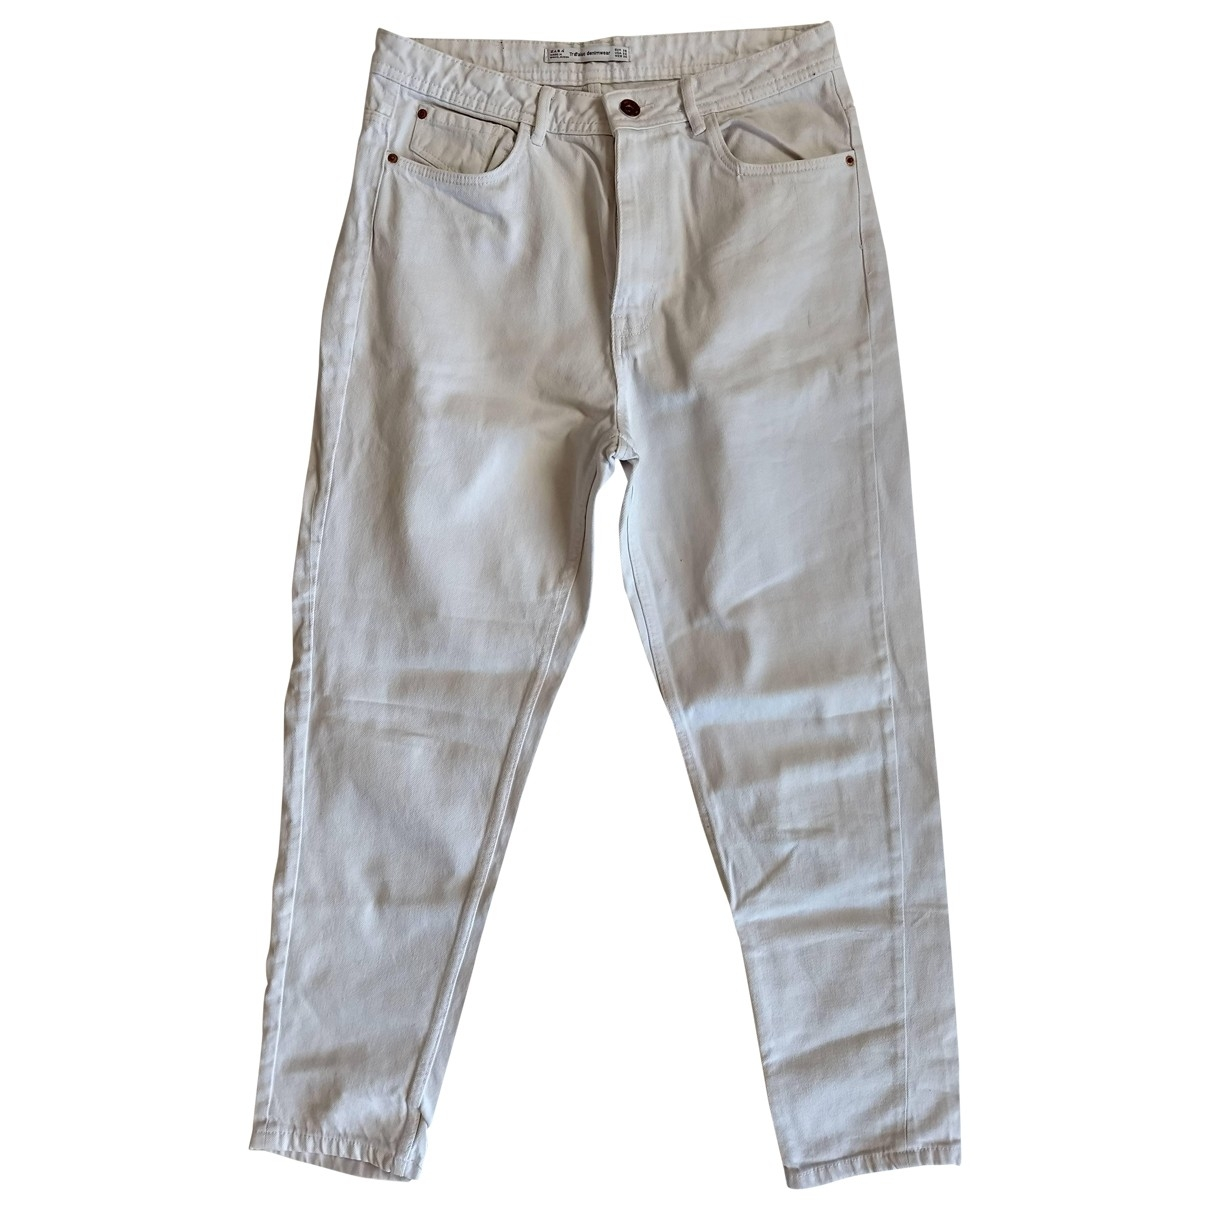 Zara \N White Cotton Trousers for Women M International